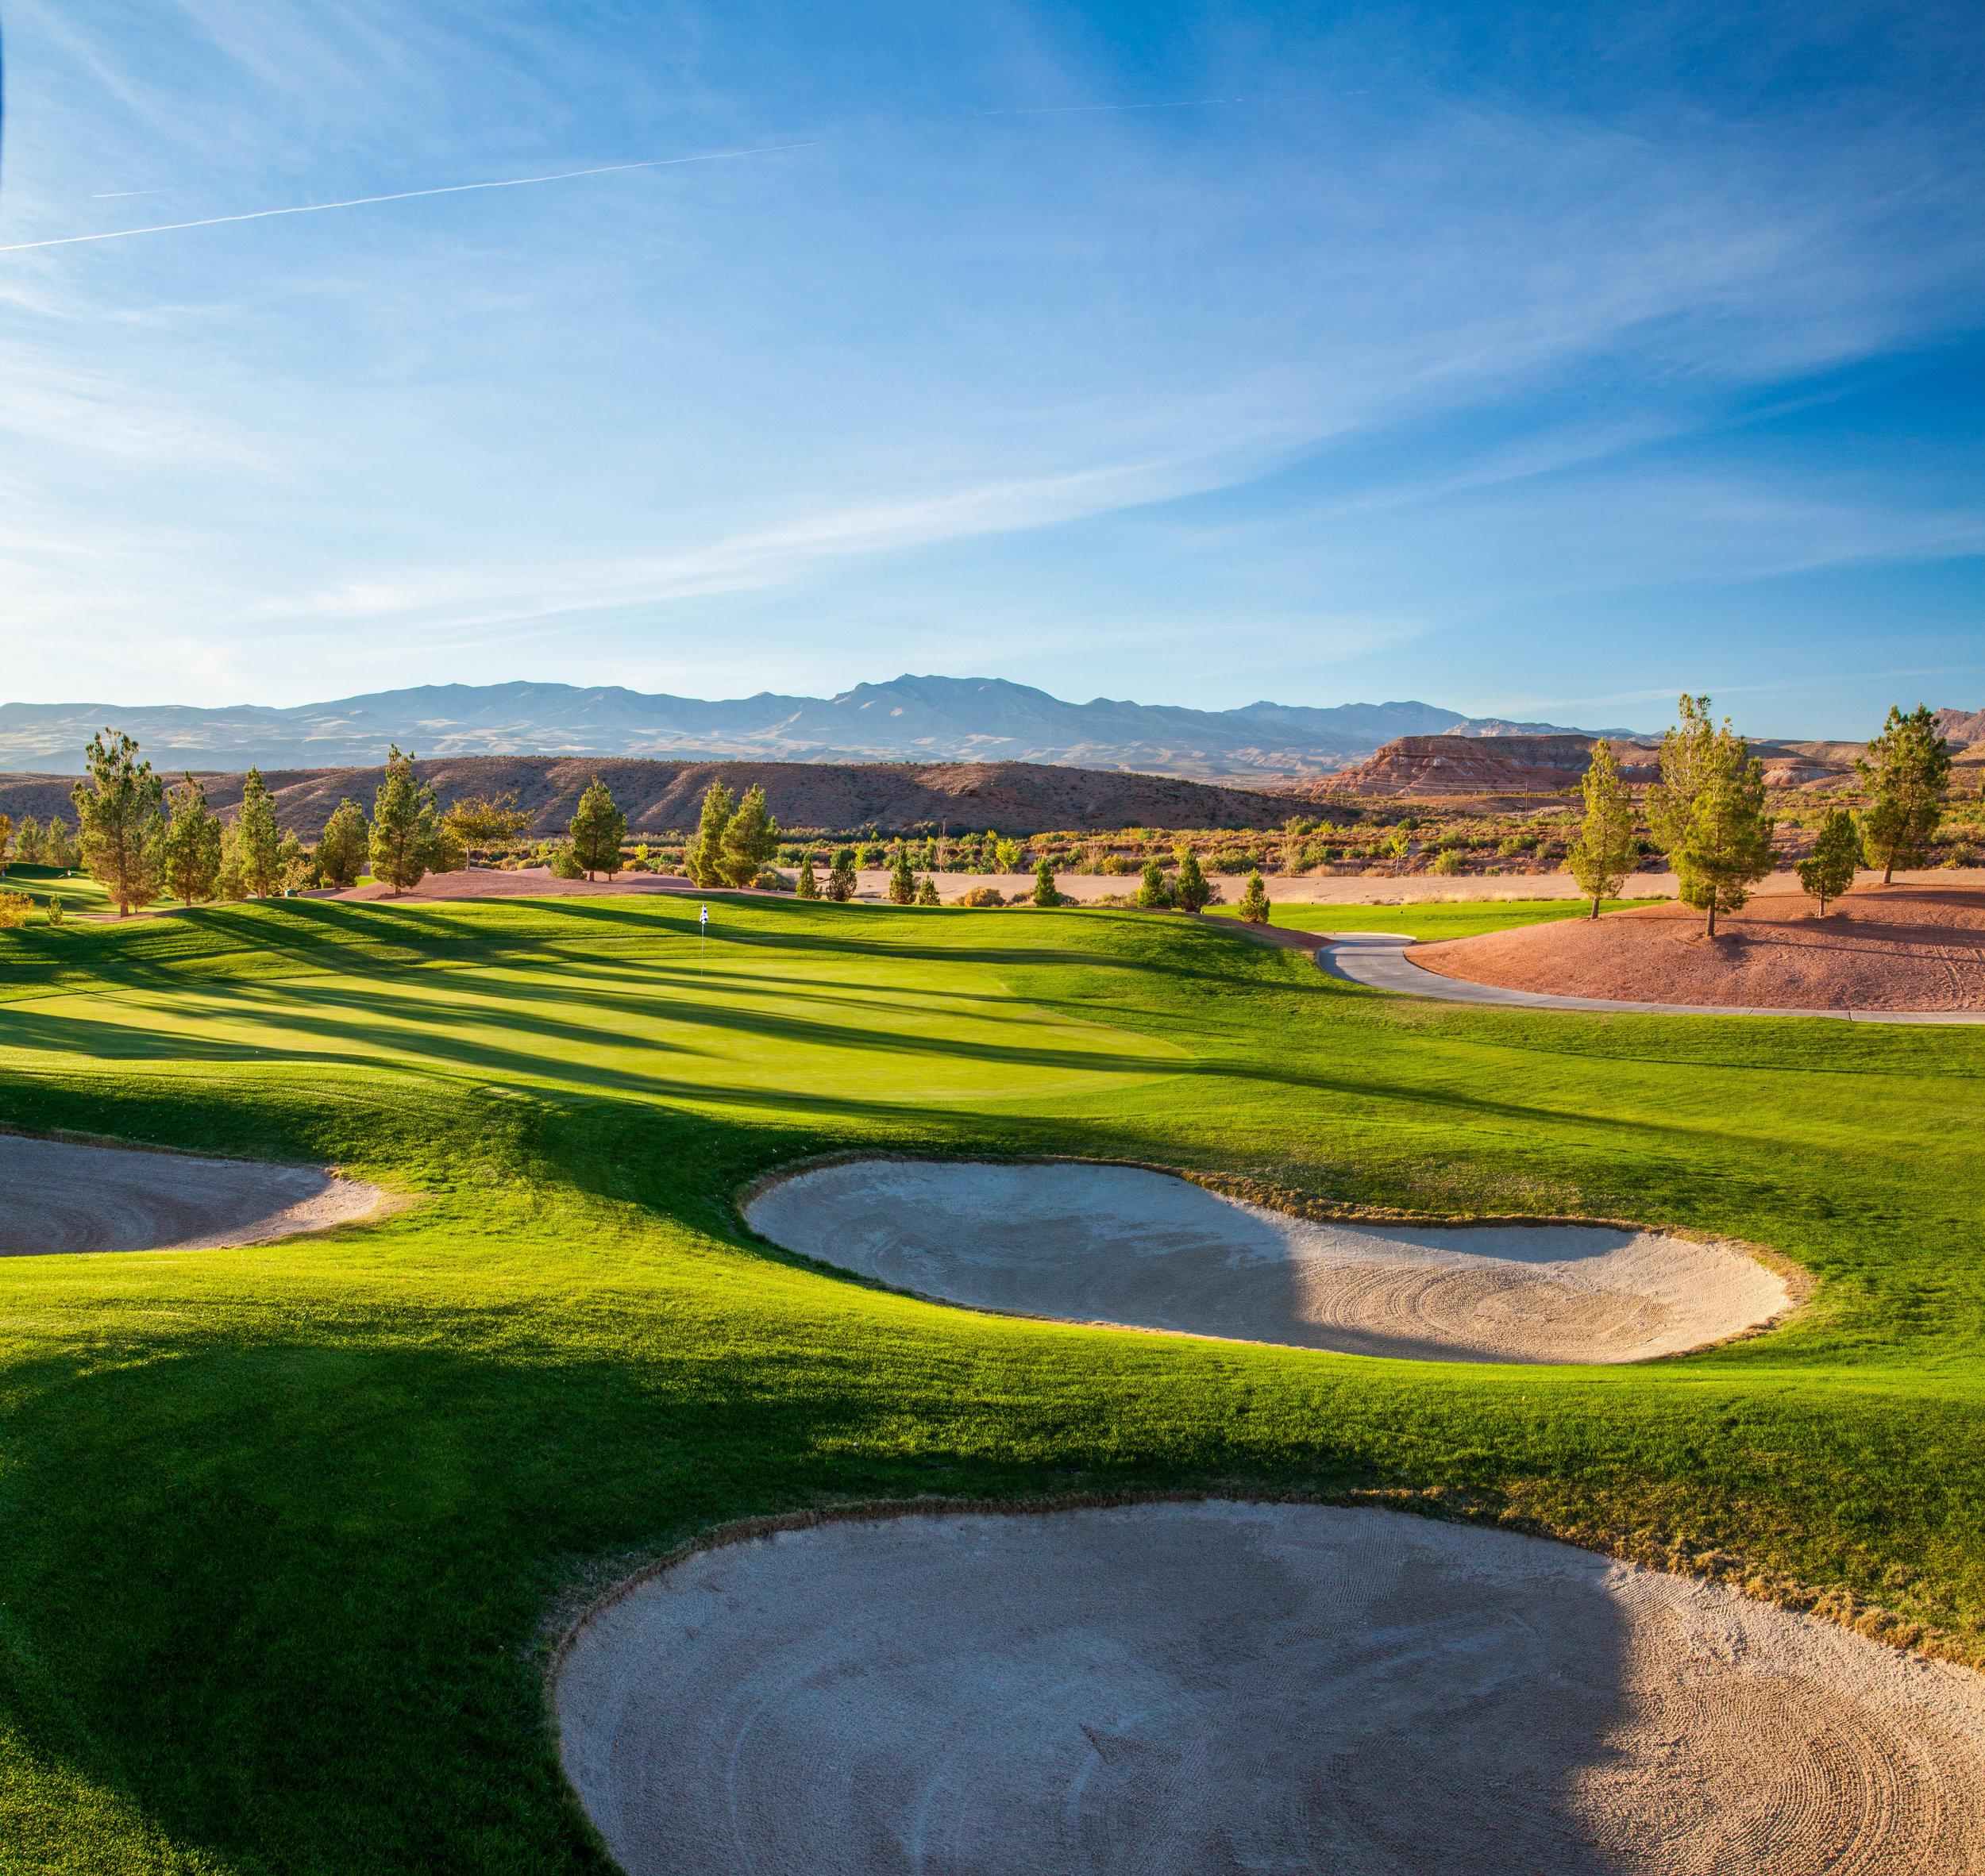 sunriver-st-george-golf-club-1.jpg